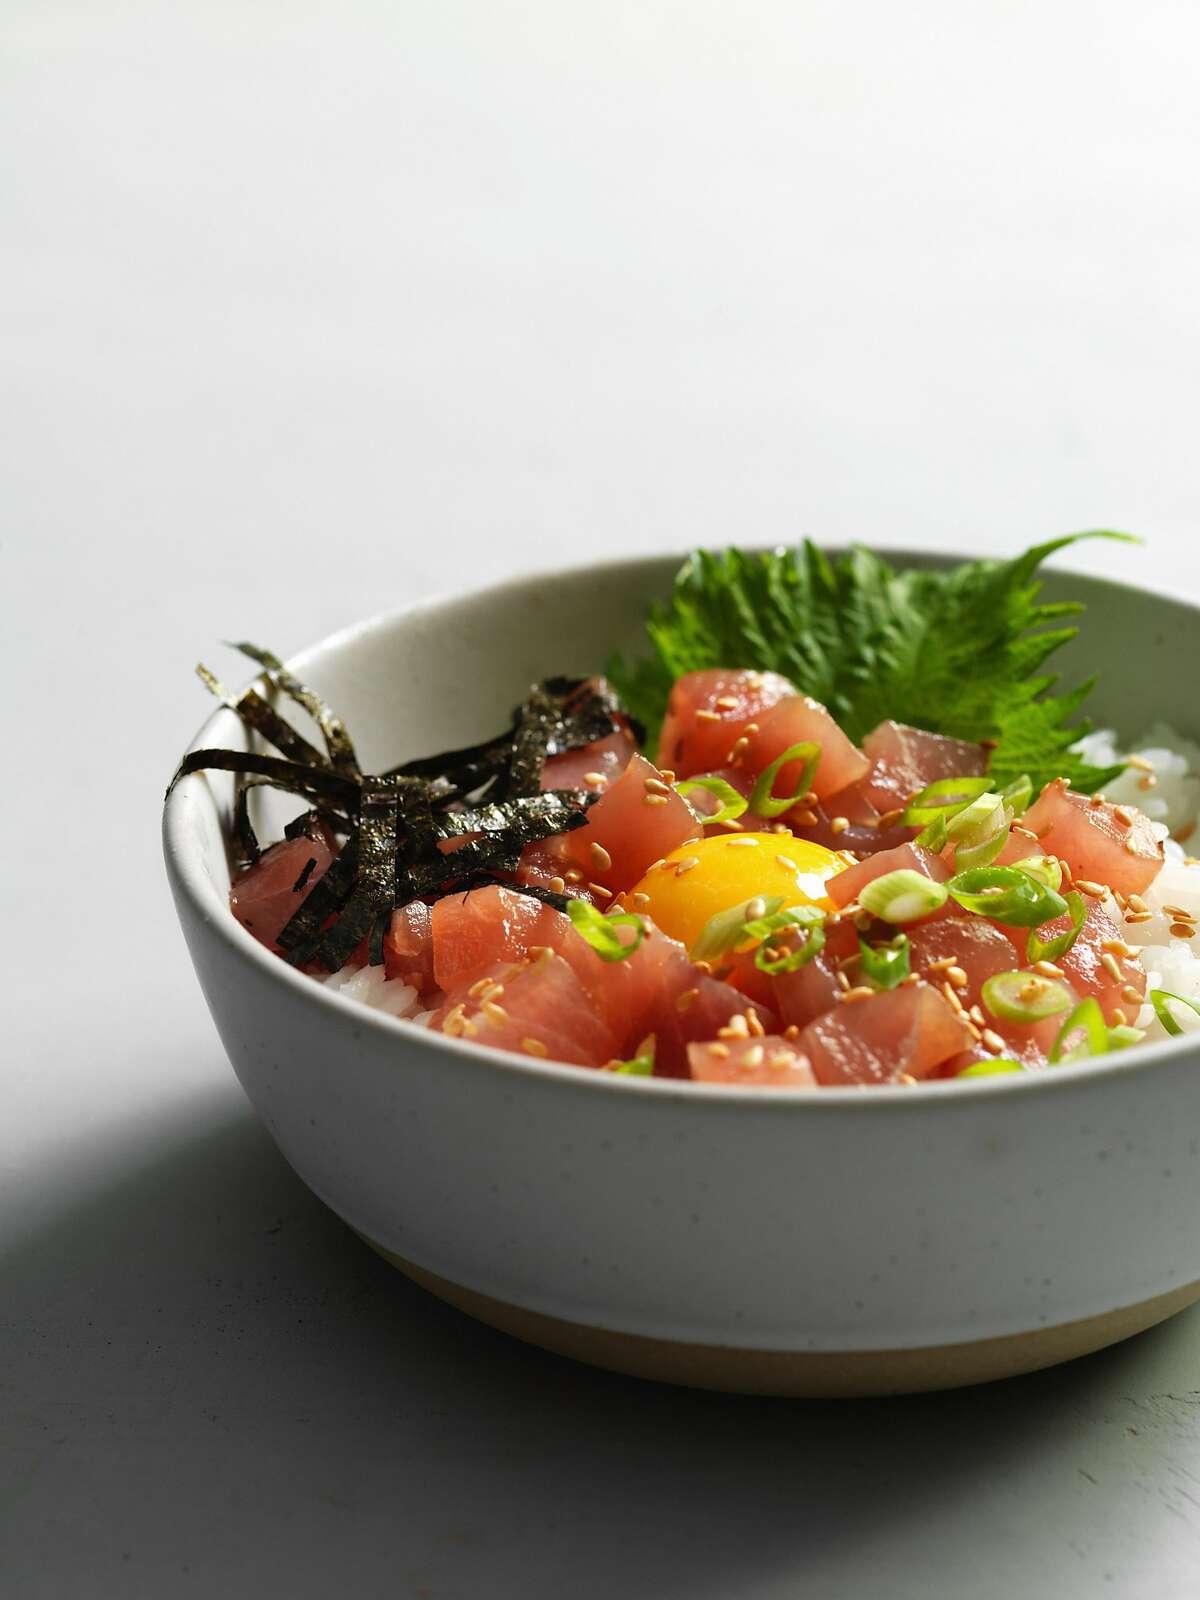 BERKELEY, CALIFORNIA - MAY 2018: Rintaro: Rice dish with marinated tuna, yellowtail, raw egg and nori.